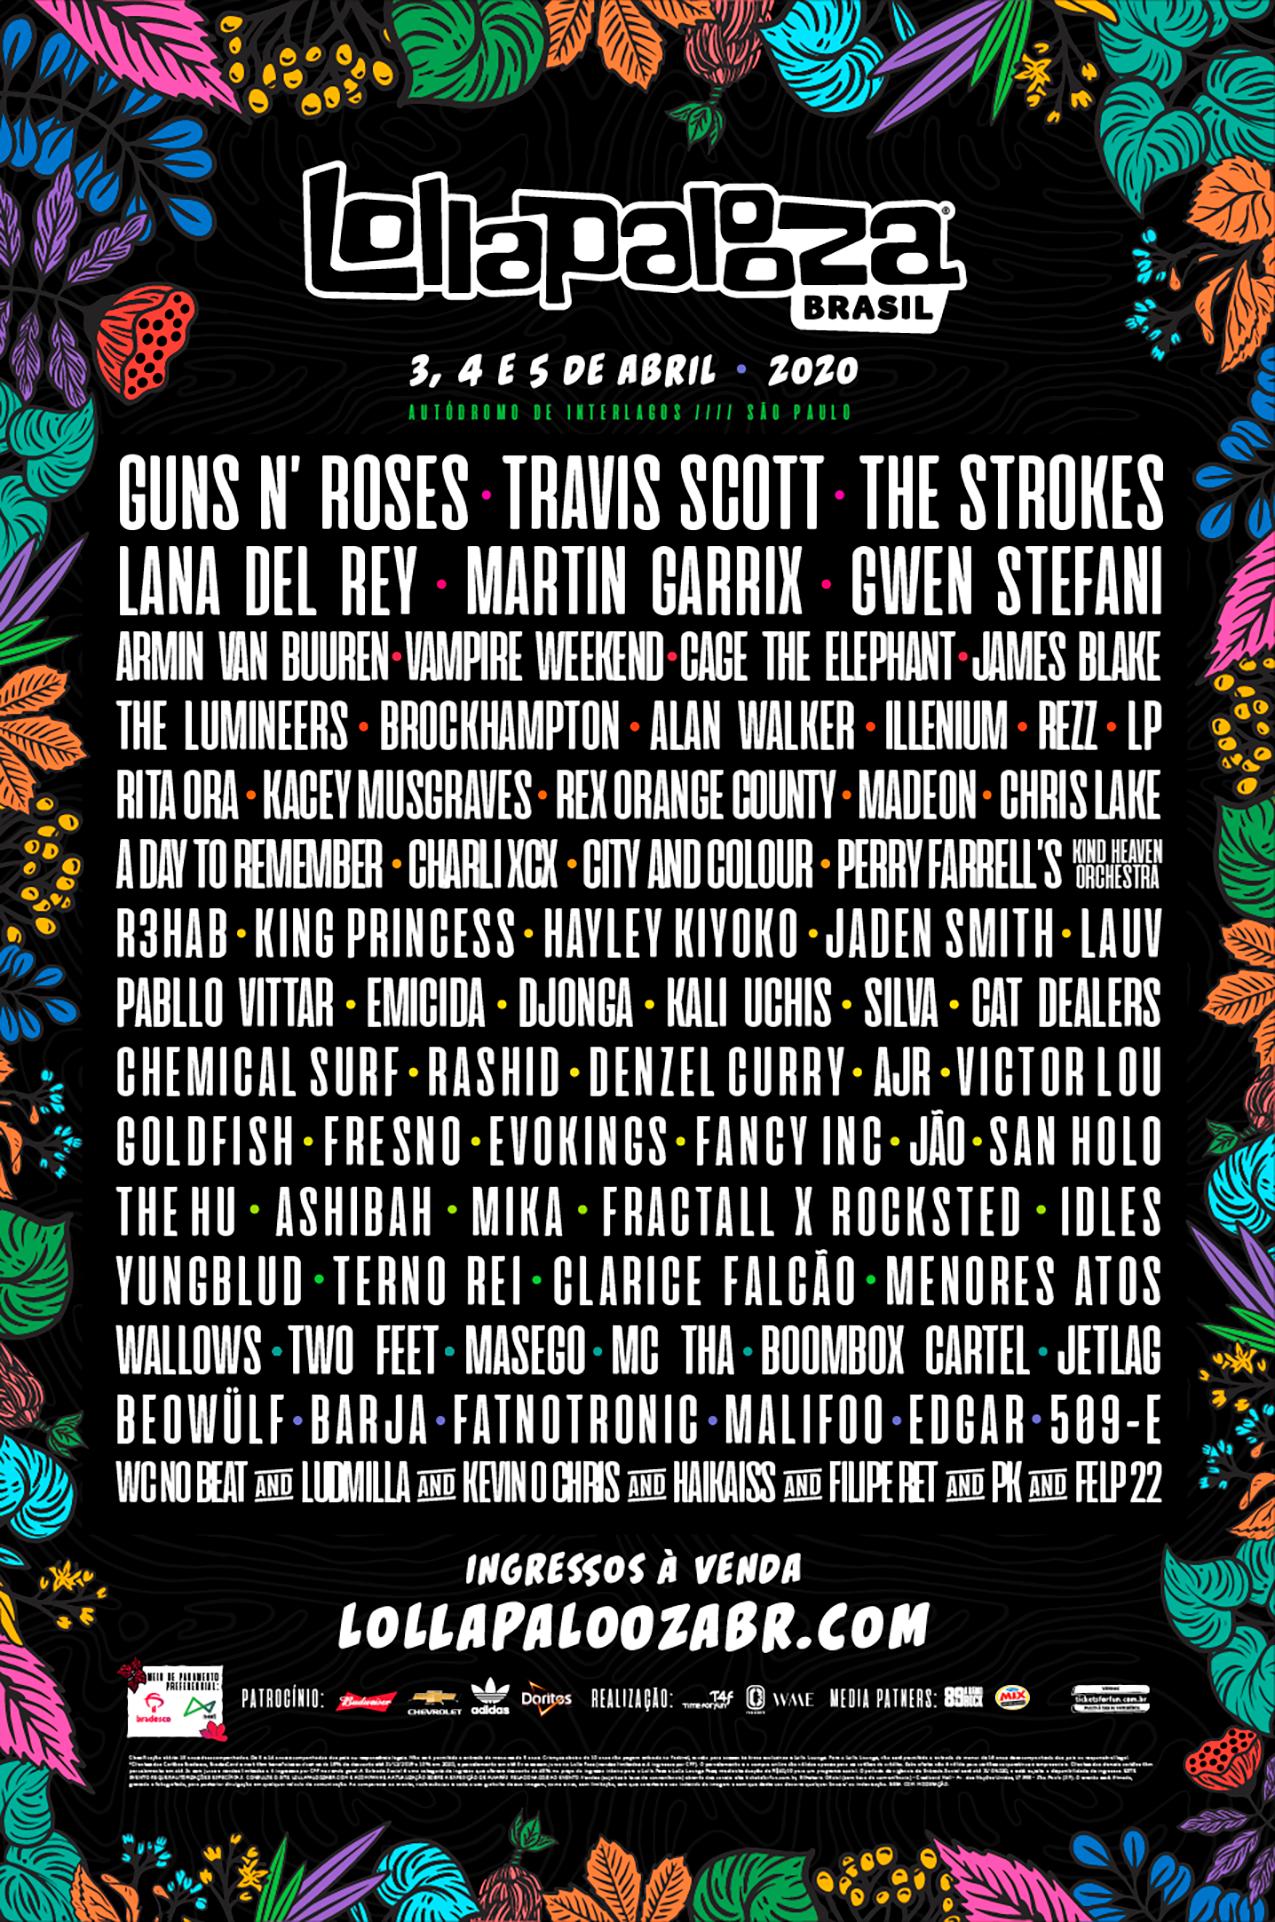 Lana del Rey, Gwen Stefani e Pabllo Vittar estão no line-up do Lollapalooza 2020